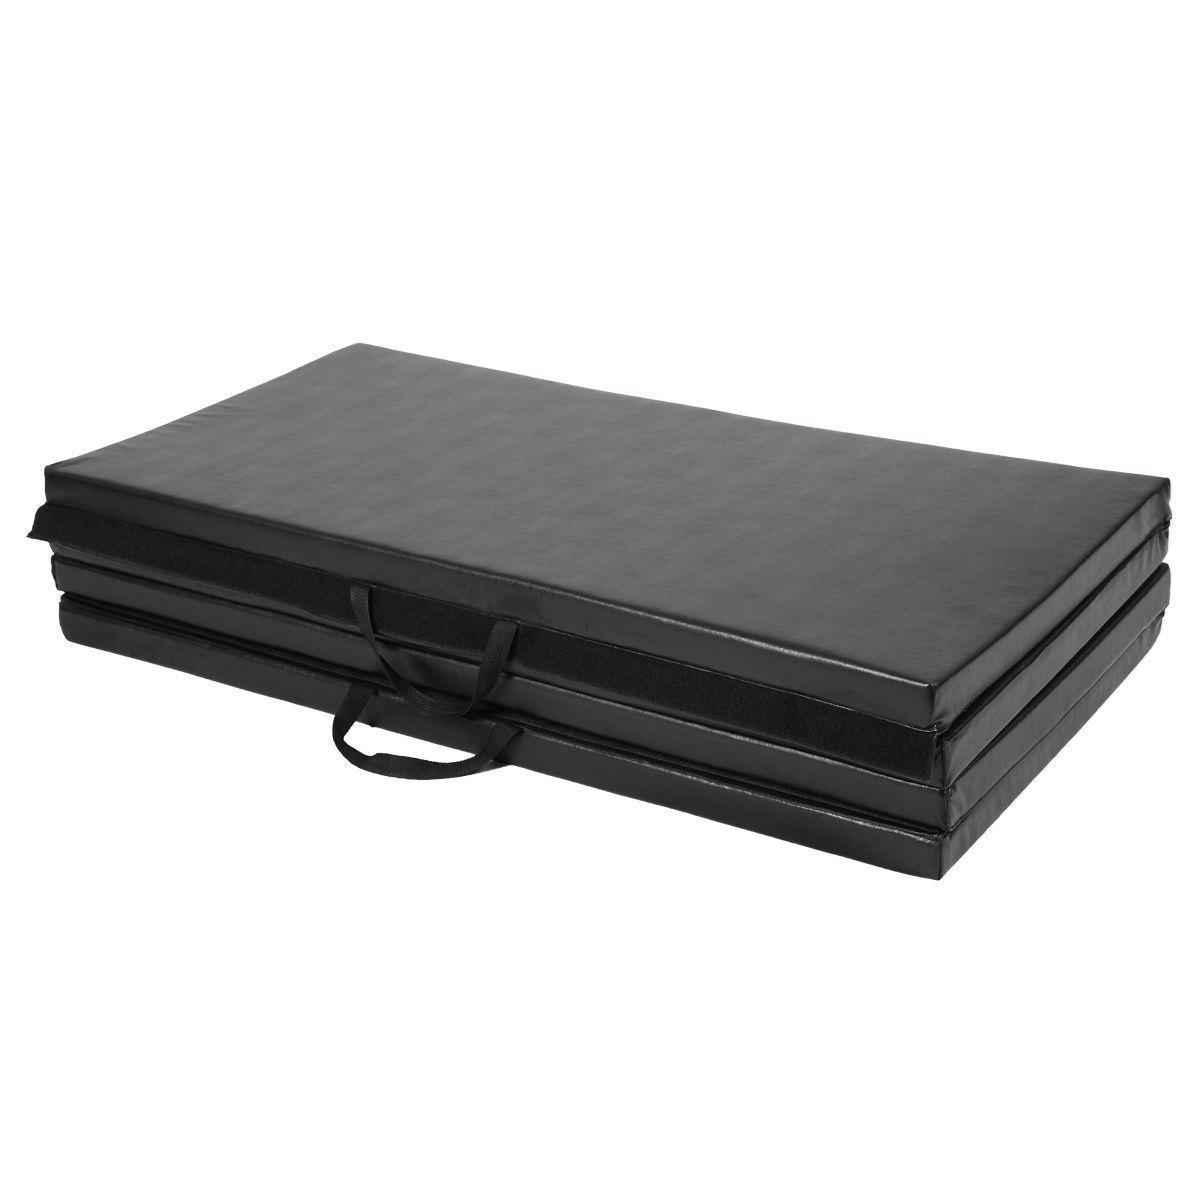 "Picture of Folding Gymnastics Mat Black - 4' x 8' x 2"""